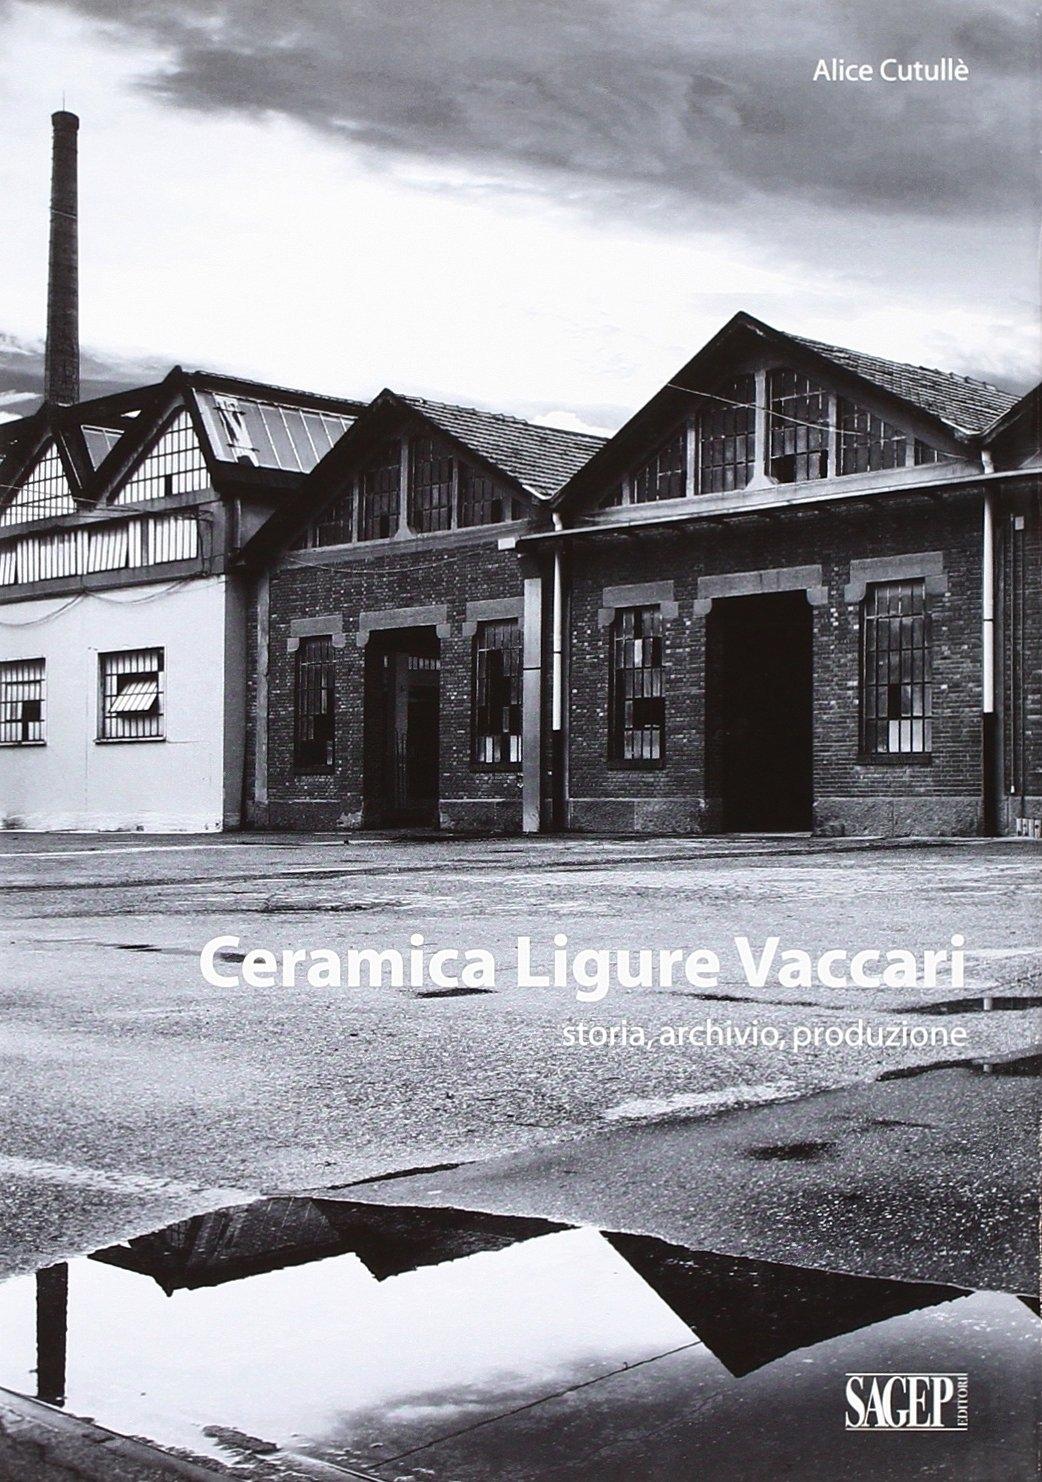 Ceramica Ligure Vaccari. Storia, Archivio, Produzione